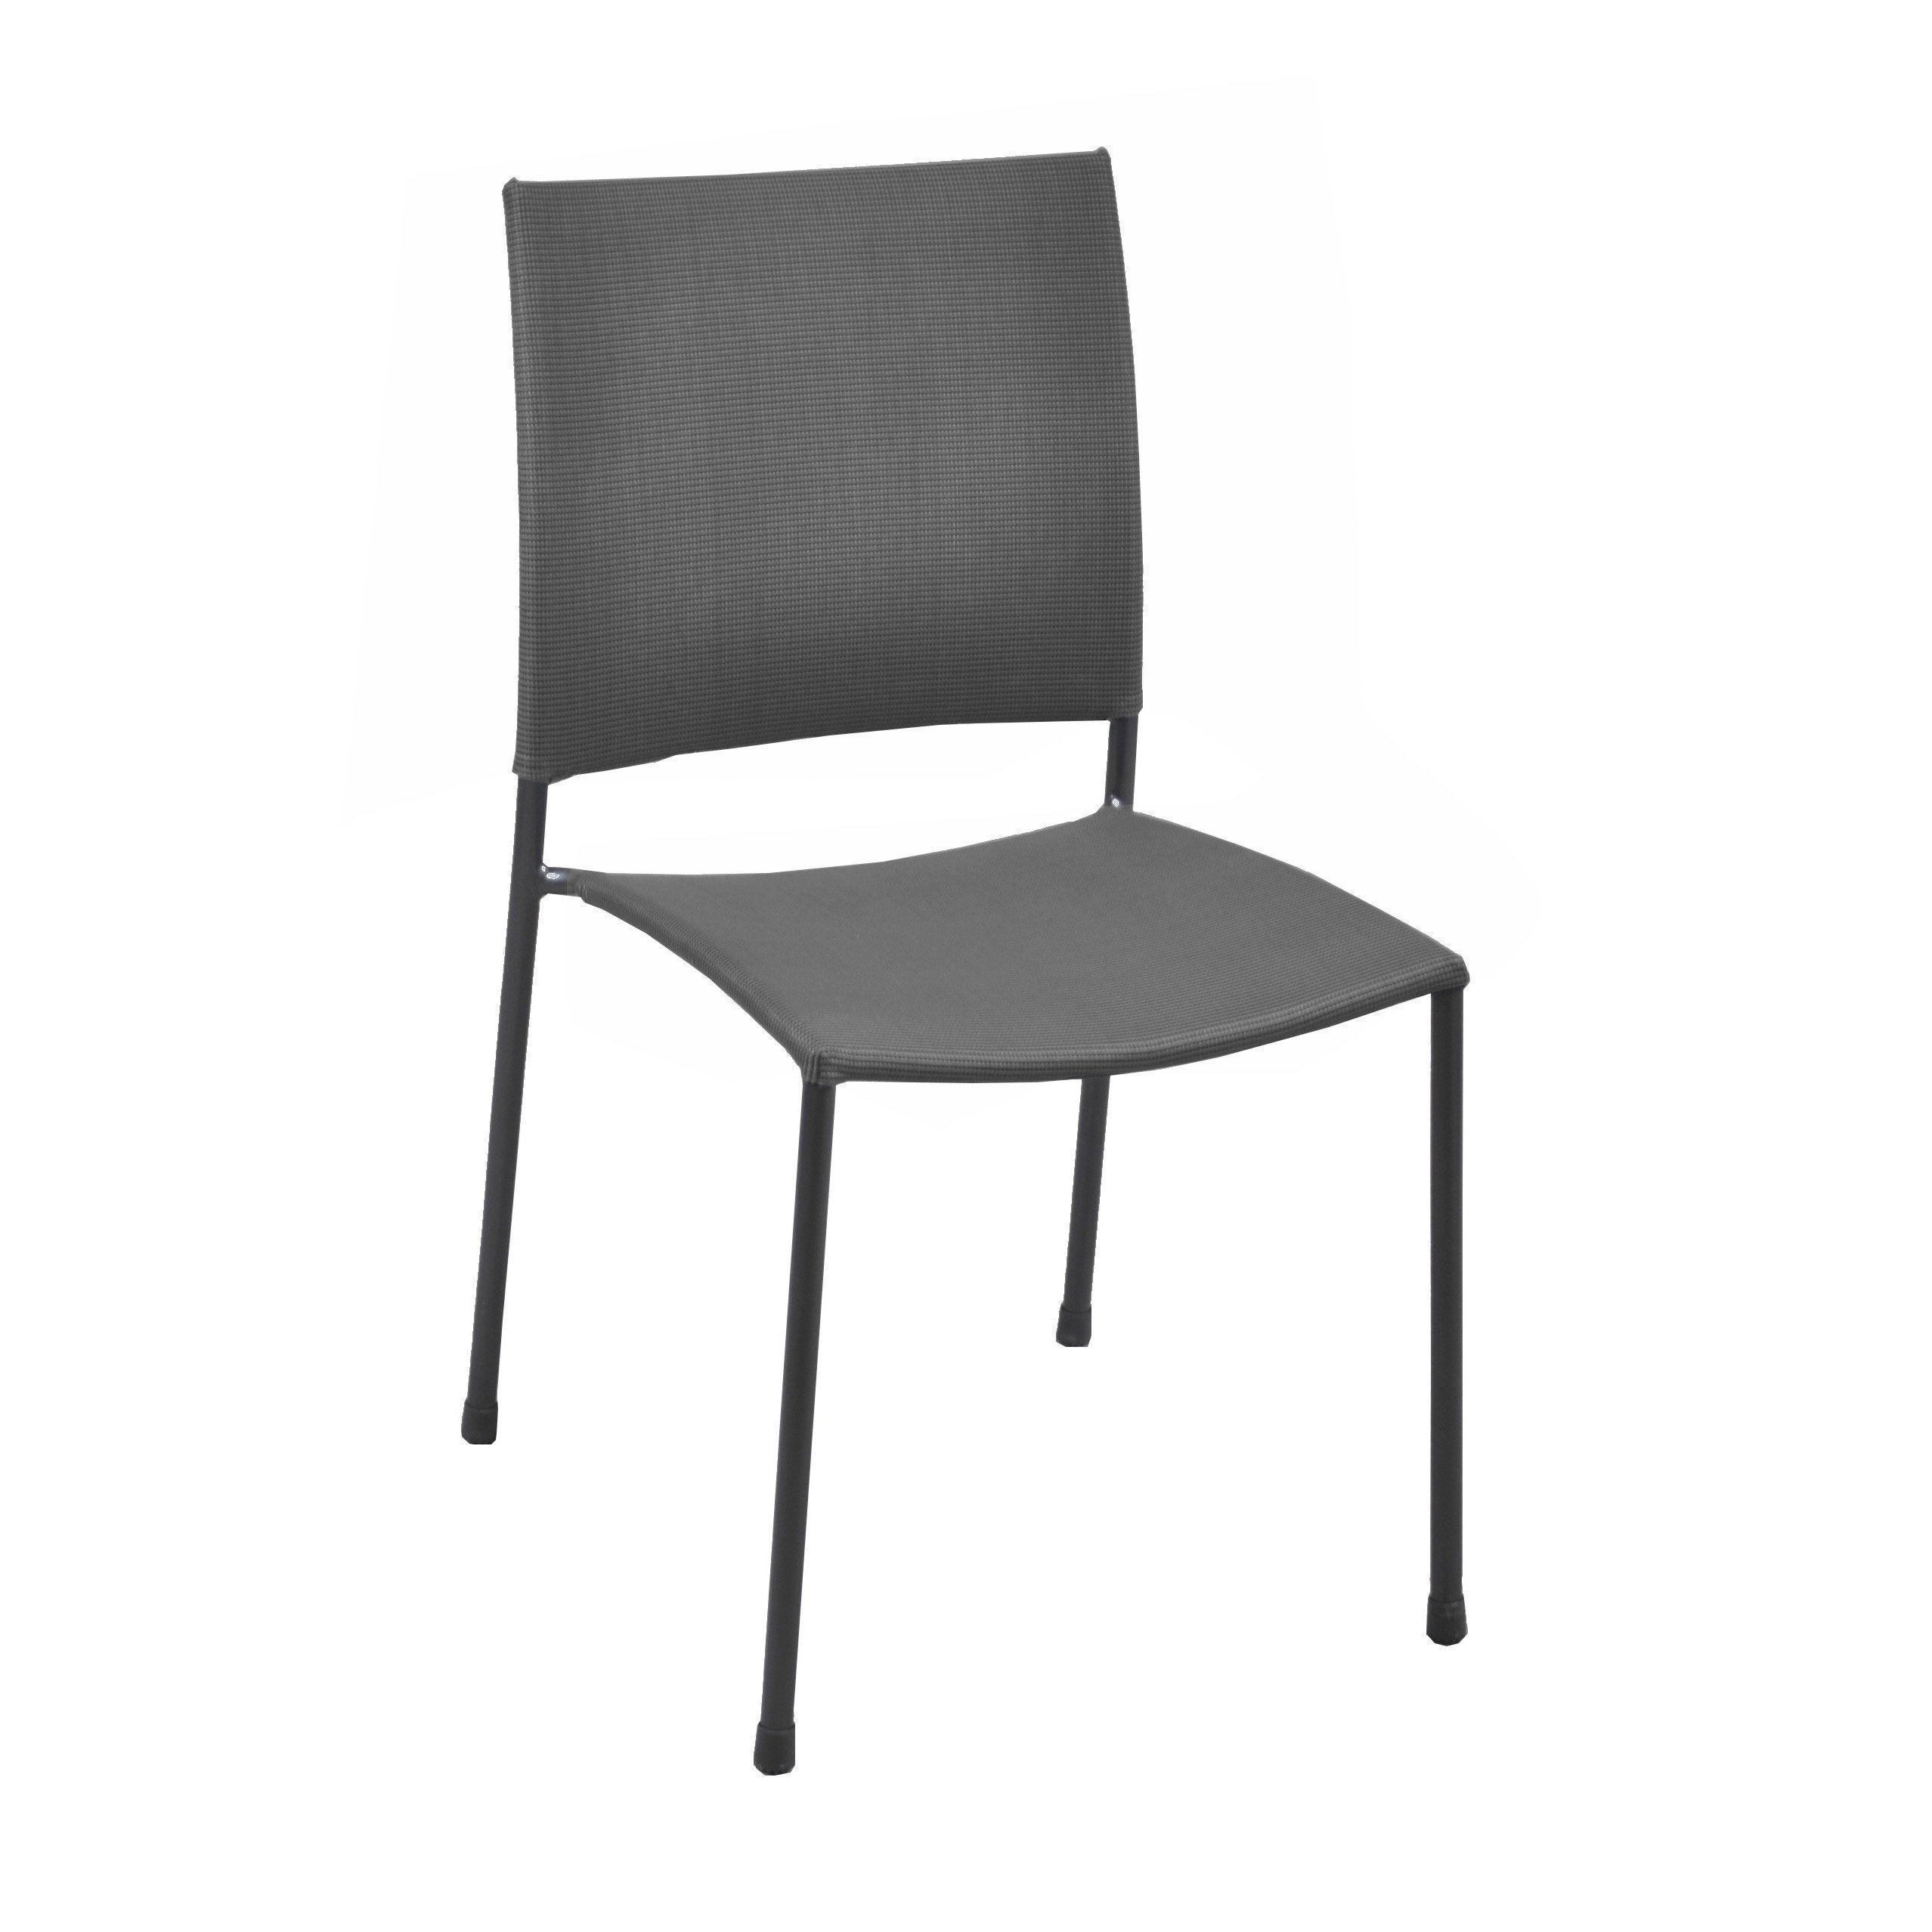 en Globe jardin Chaise acier de gris IeWEDH92Y